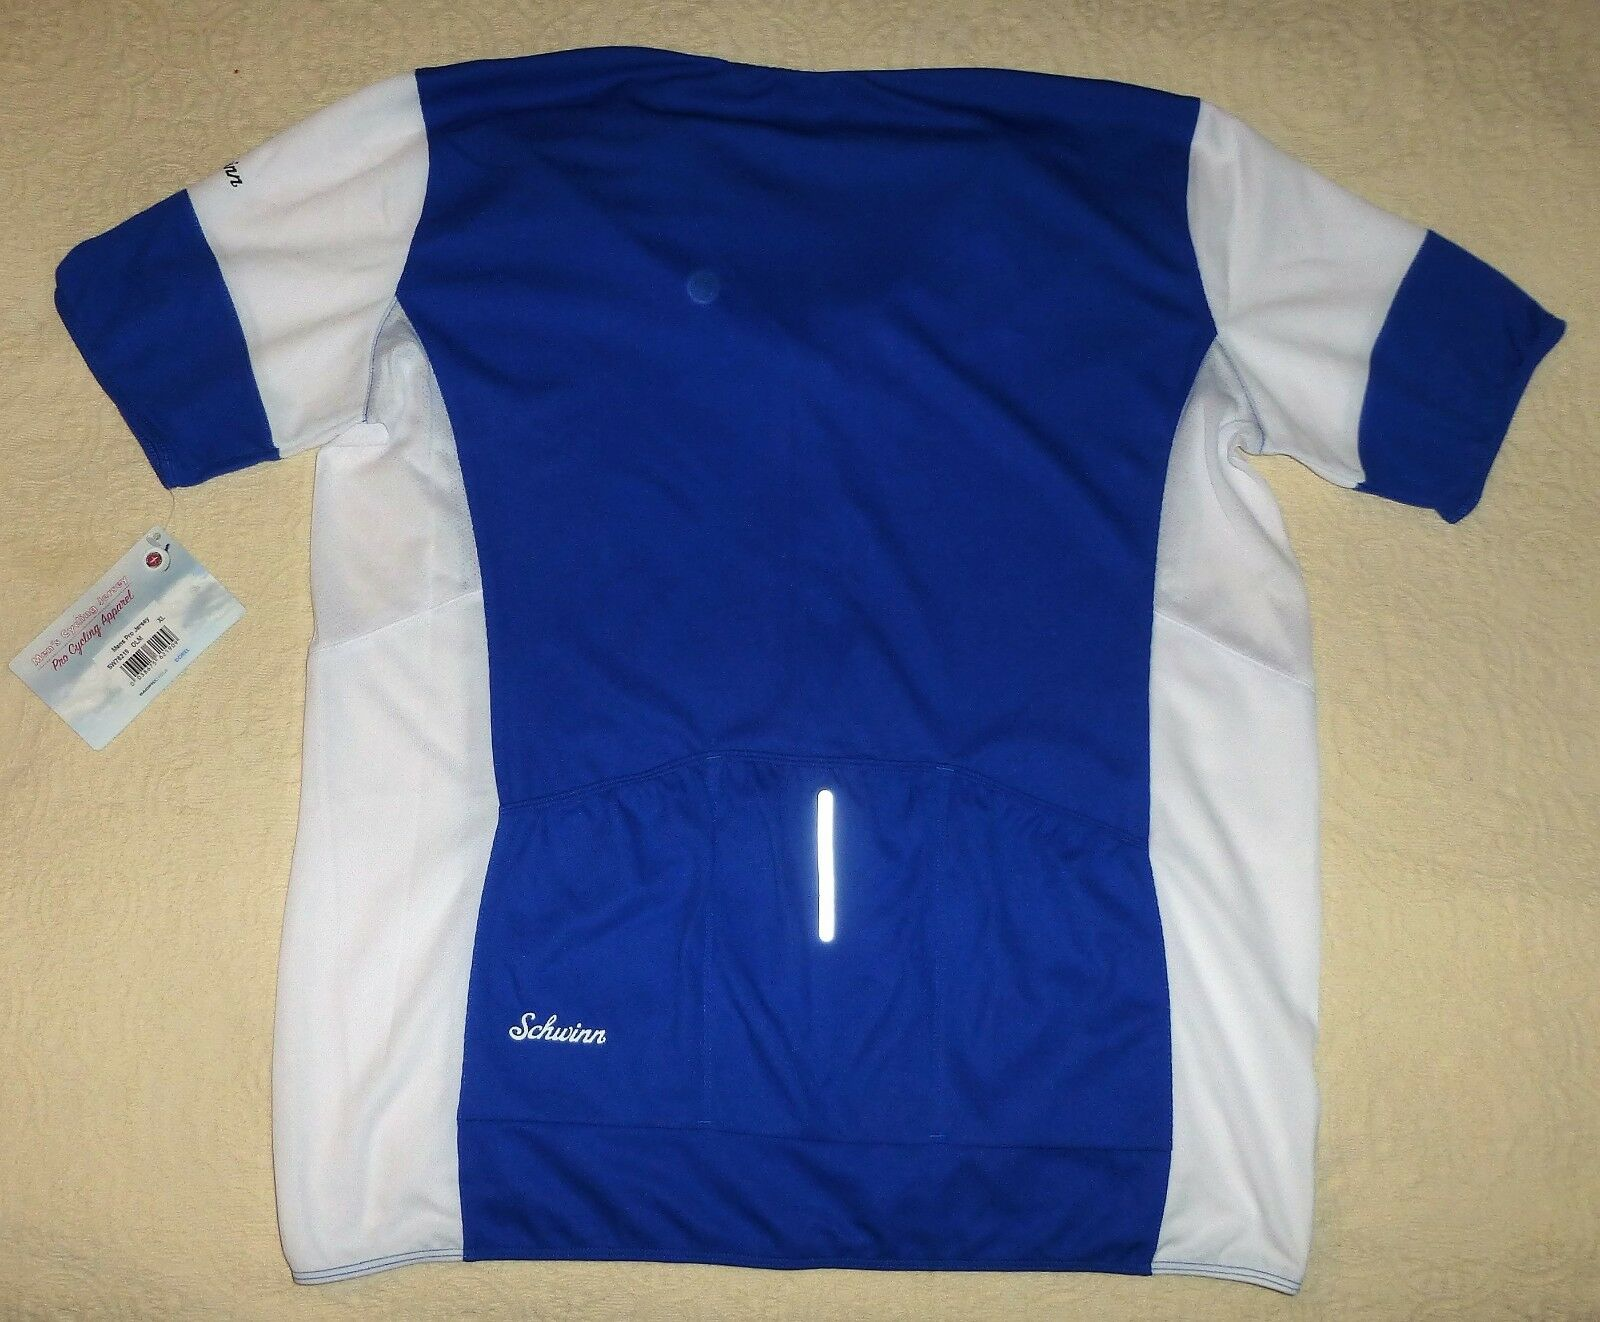 Medium Men s Schwinn Pro Blue   White Cycling Jersey Full ZIPPER ... 72f649c21